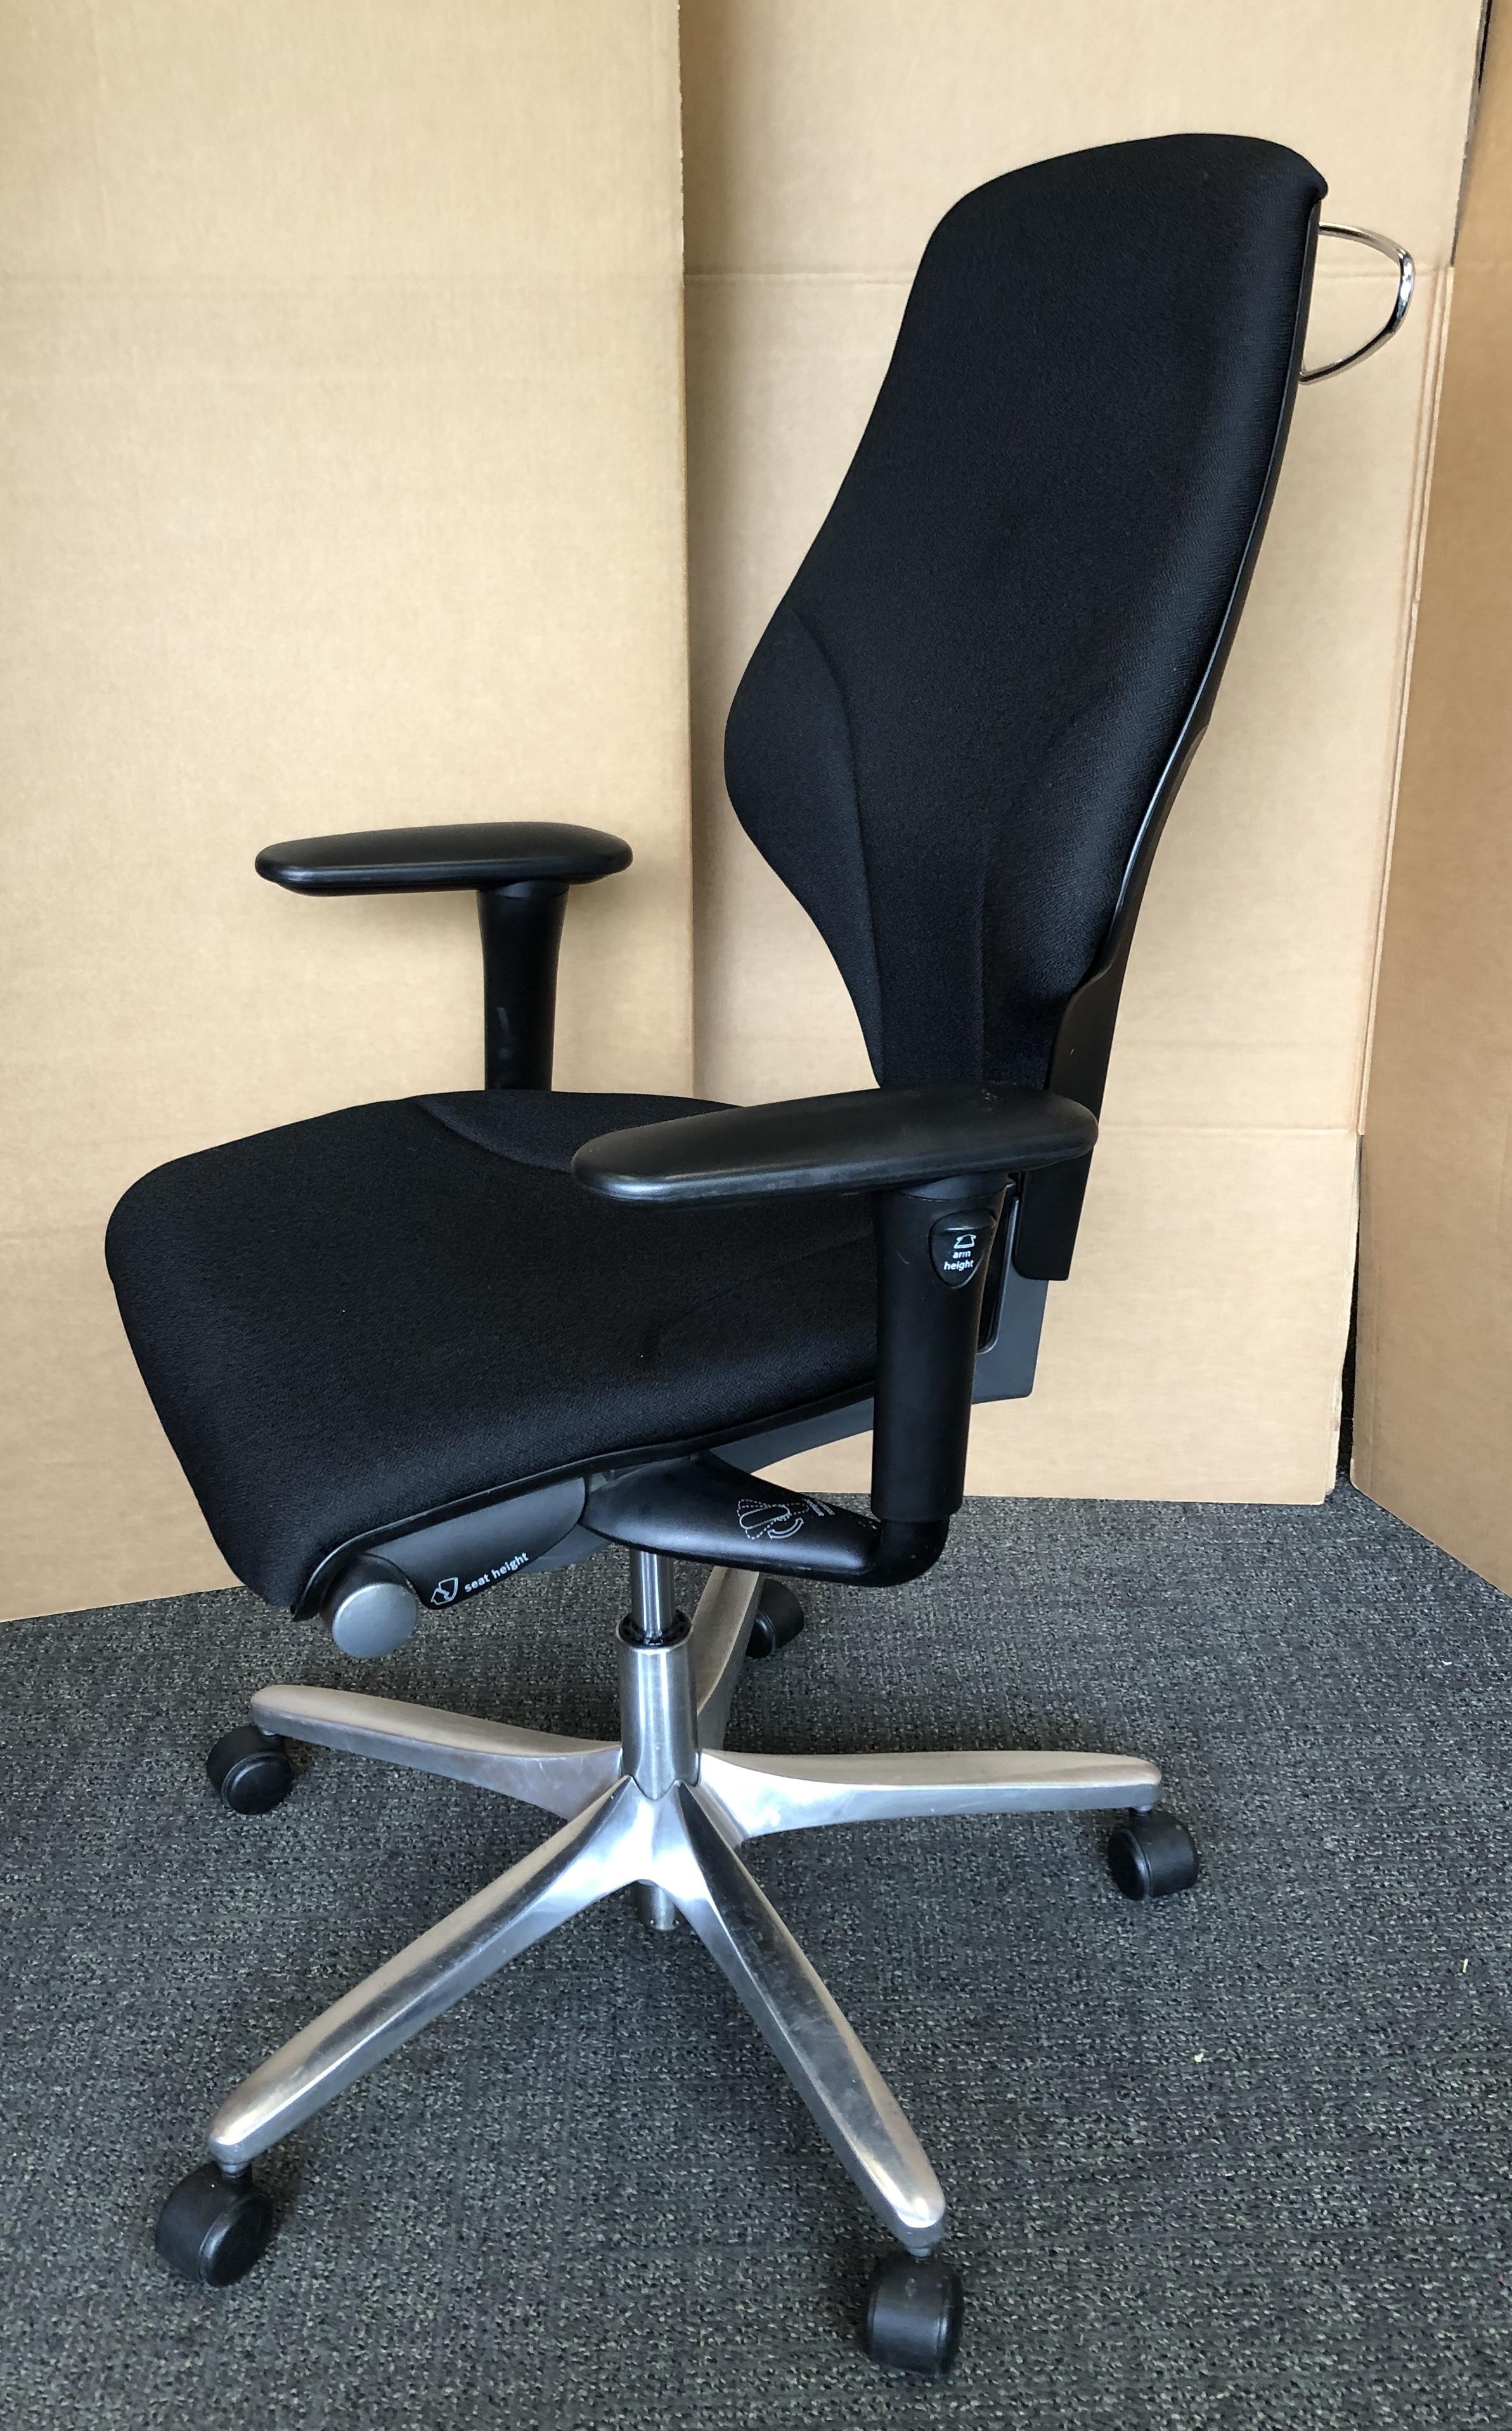 Giroflex G64 New Black Fabric Ergonomic Swivel Office